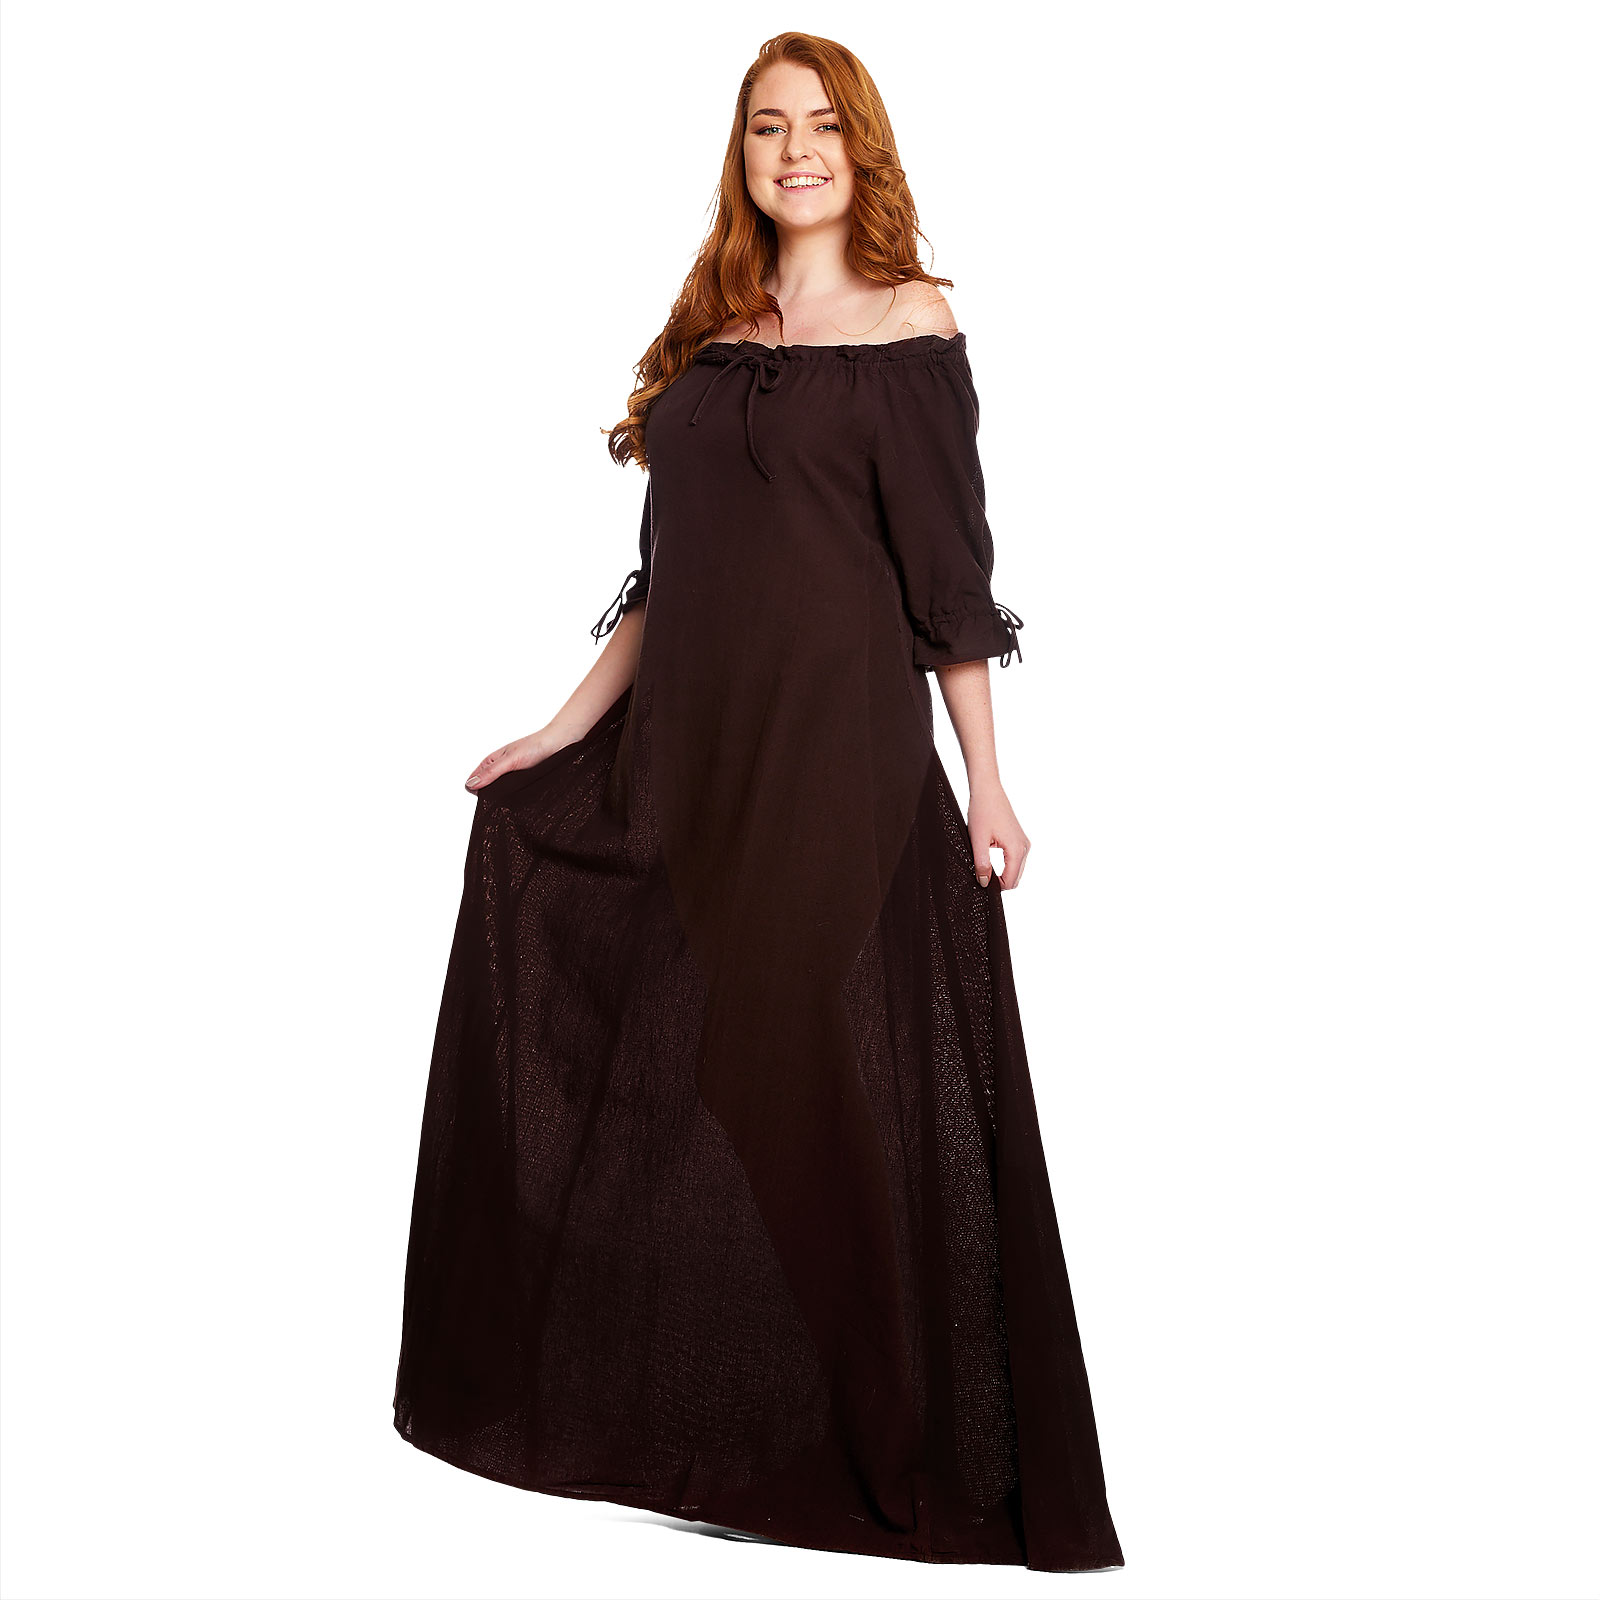 Mittelalter Kleid Kurzarm braun